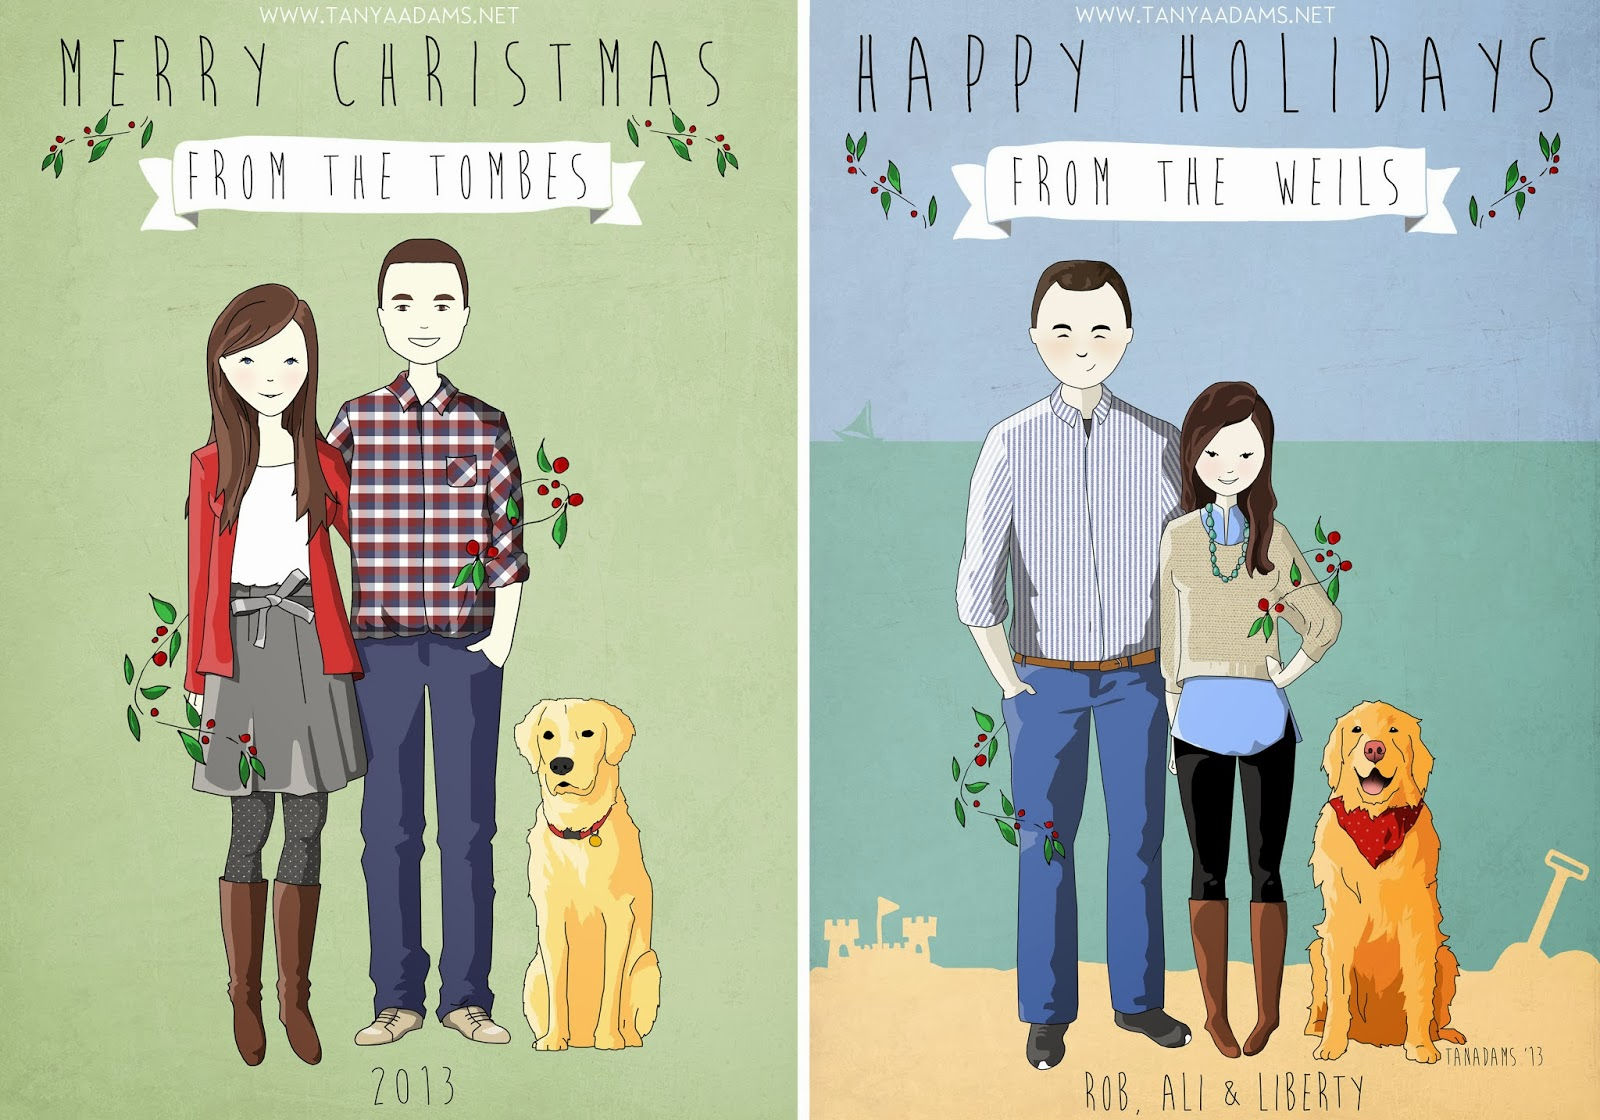 Tanya Adams Illustrations and photography: Custom Christmas Cards